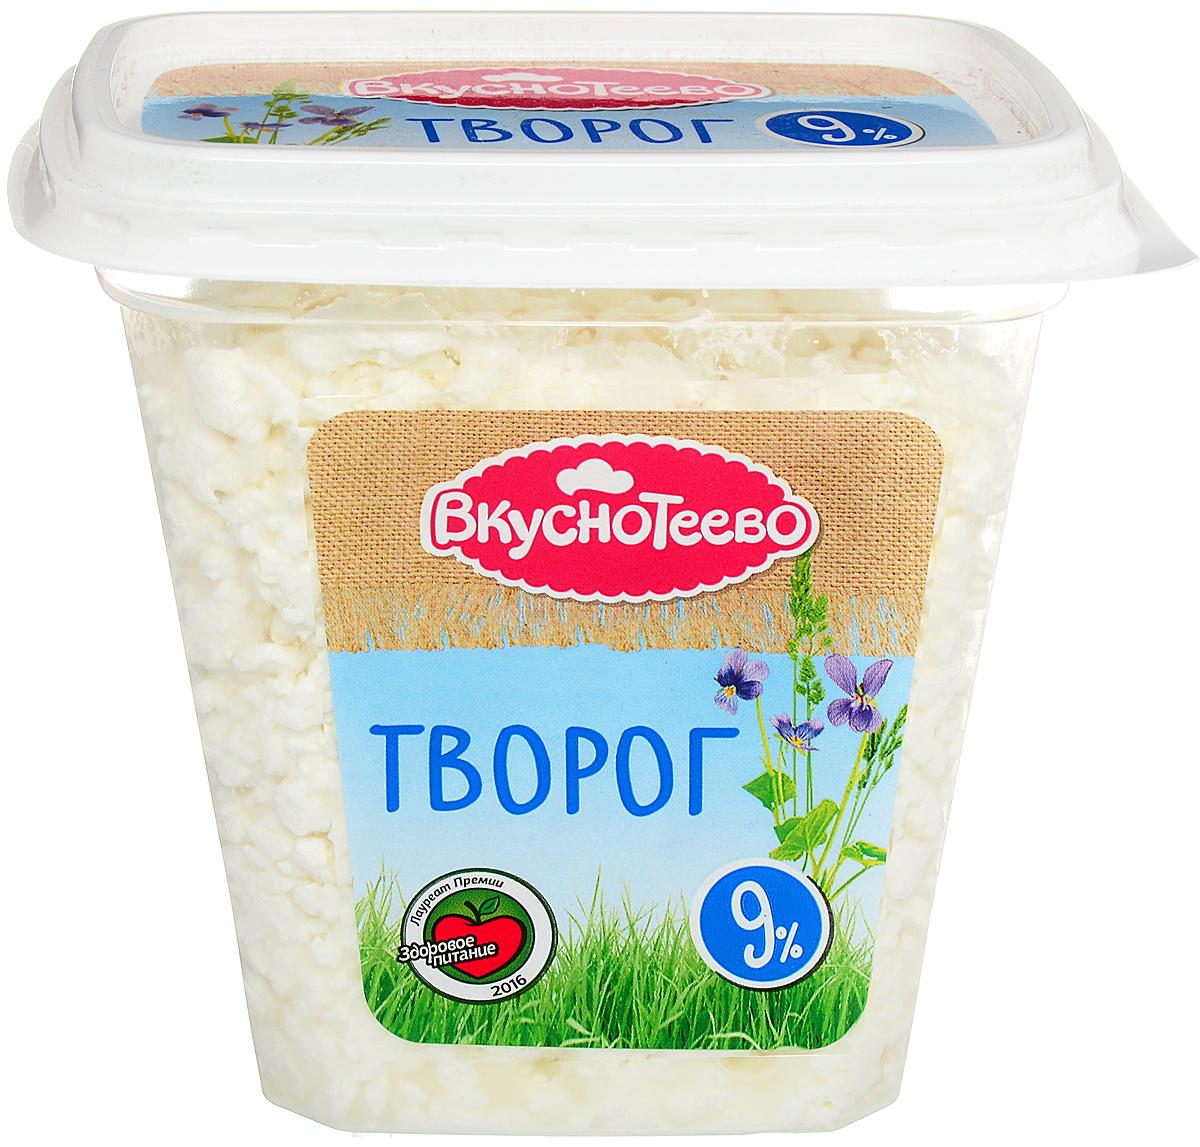 Вкуснотеево Творог 9%, 300 г. 14159 вкуснотеево ряженка 4